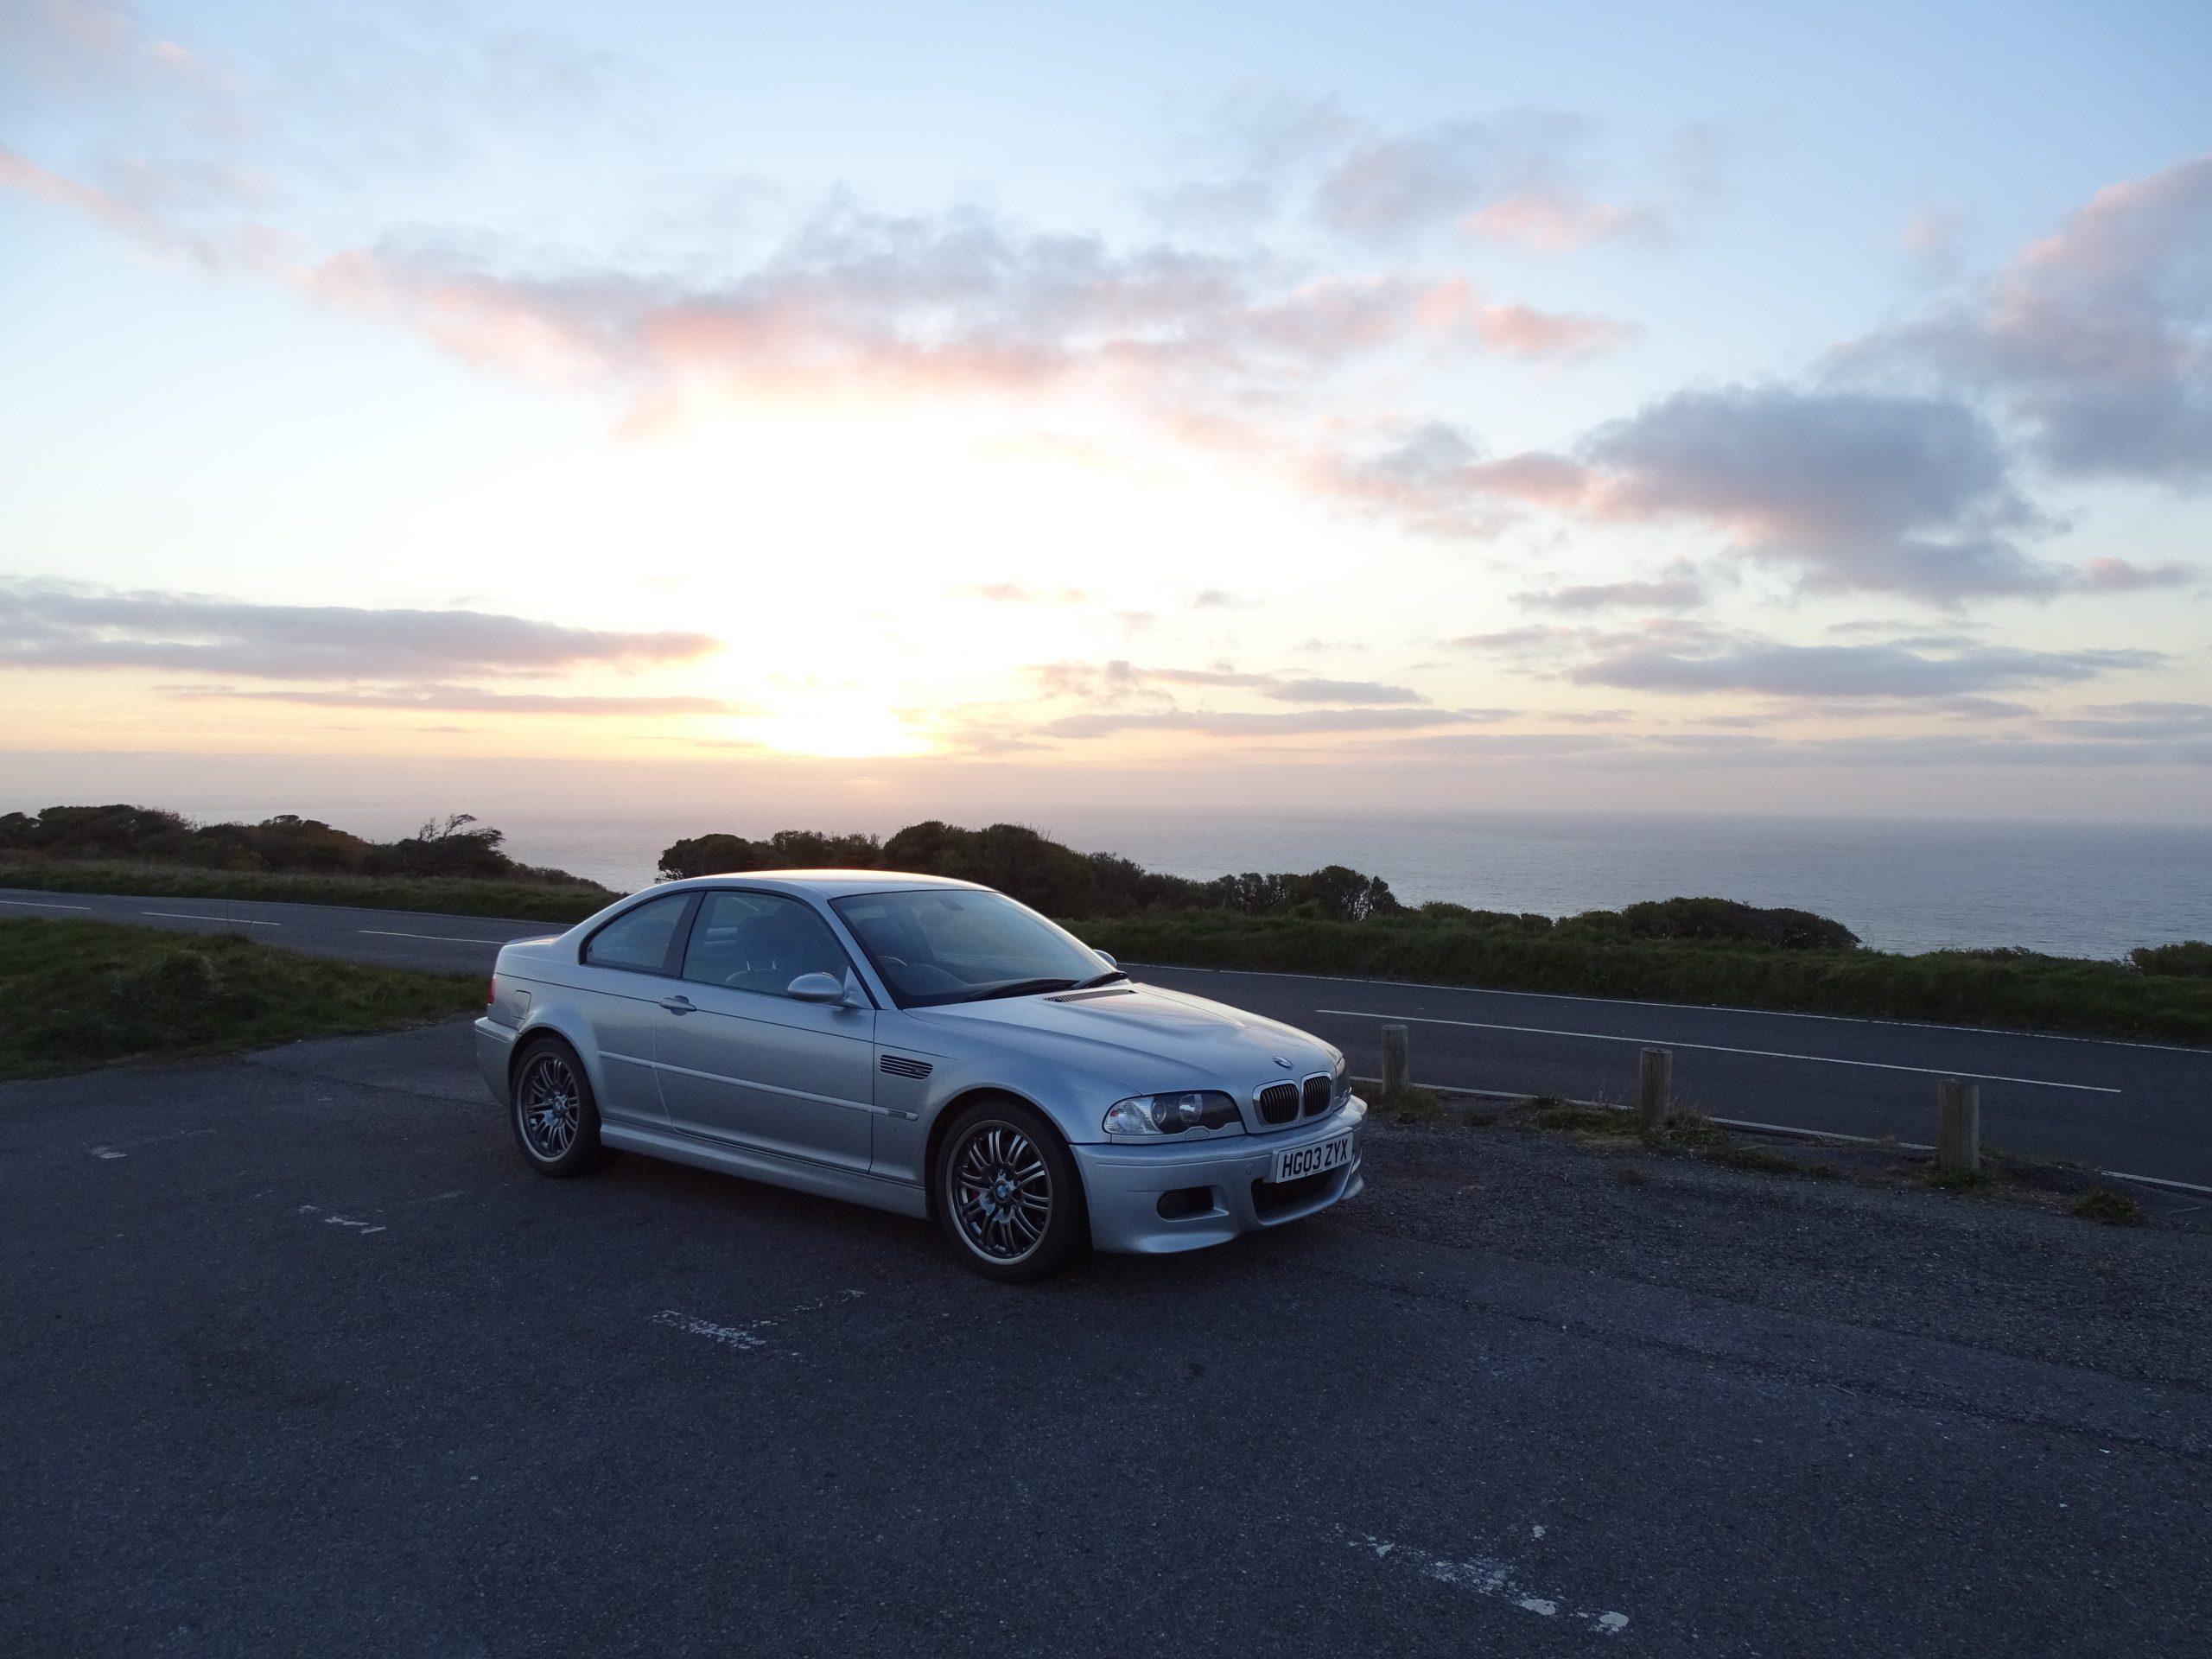 Dawn Patrol: Beachy Head, East Sussex